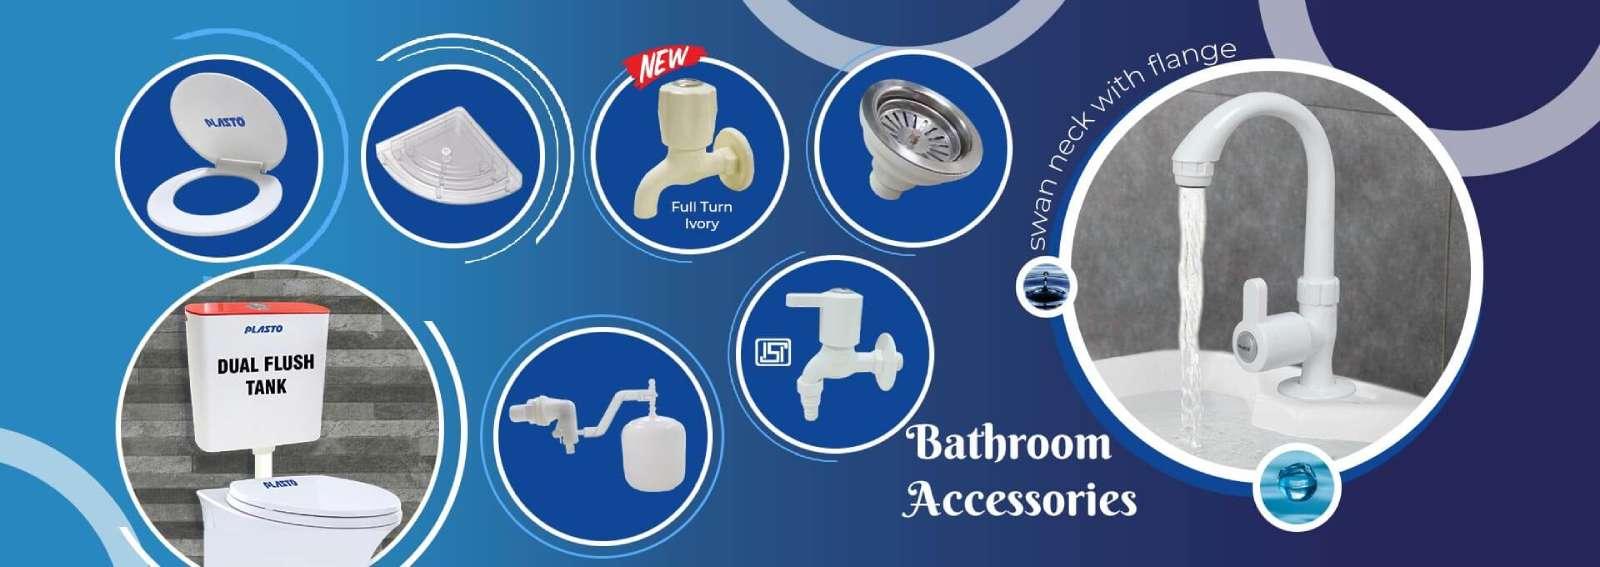 Bathroom Accessories Banner